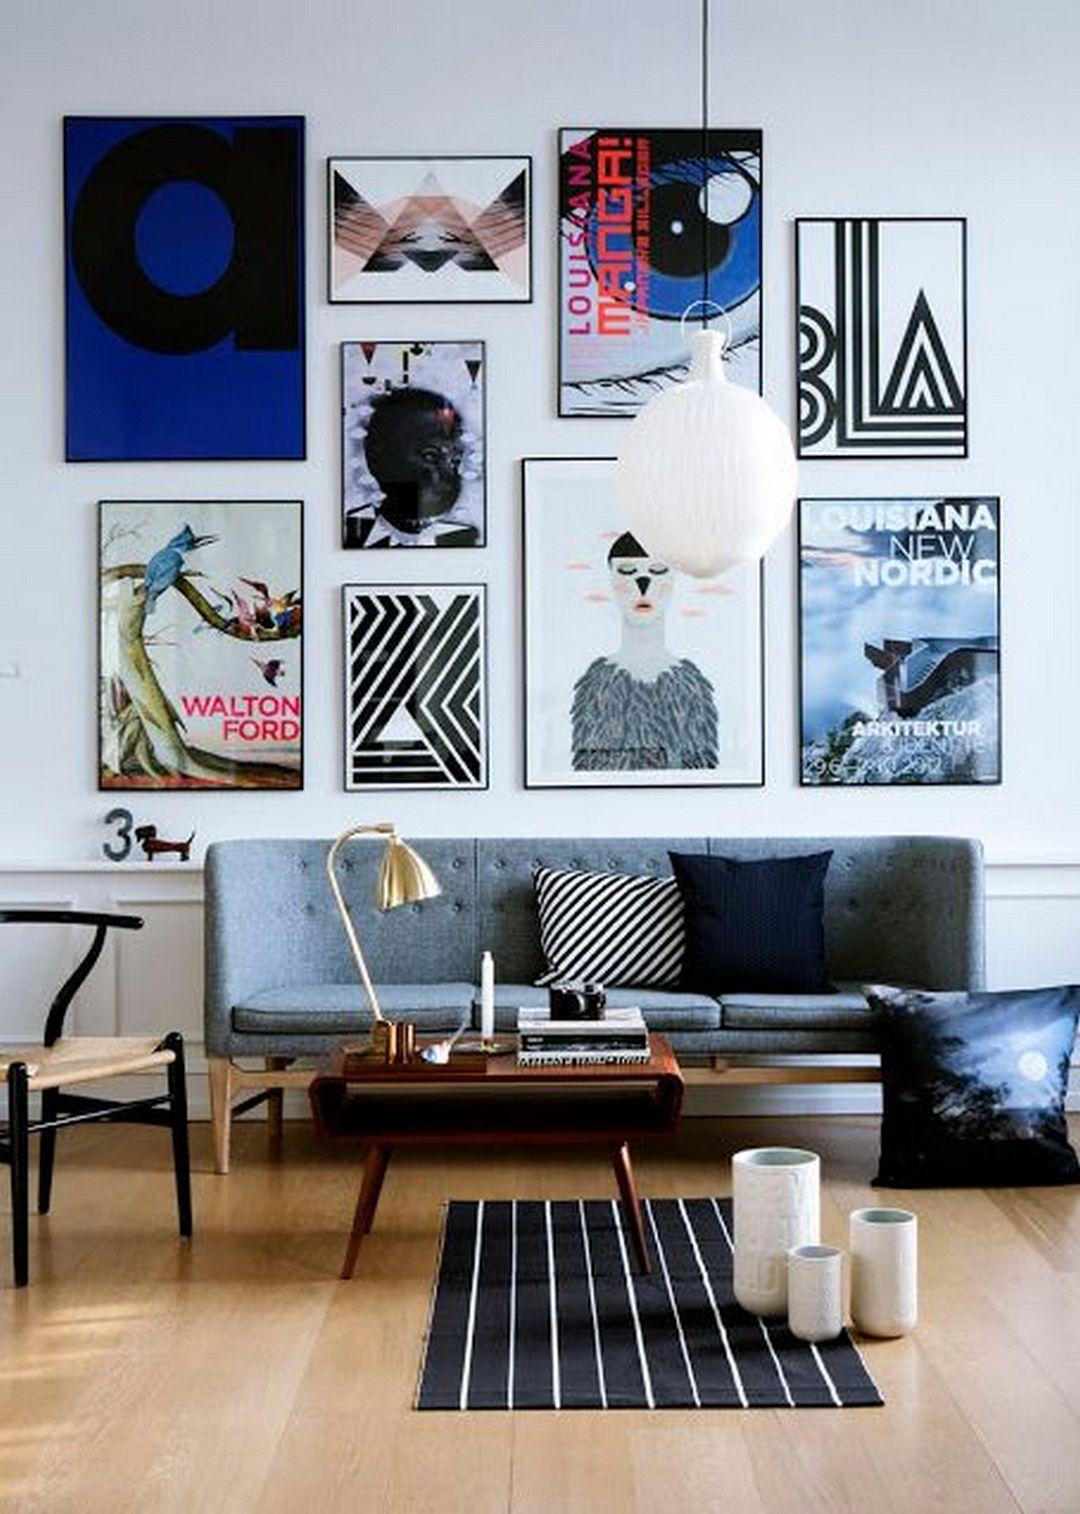 64 Wonderful Minimalist Living Room Decor Ideas https://www.futuristarchitecture.com/11295-minimalist-living-rooms.html